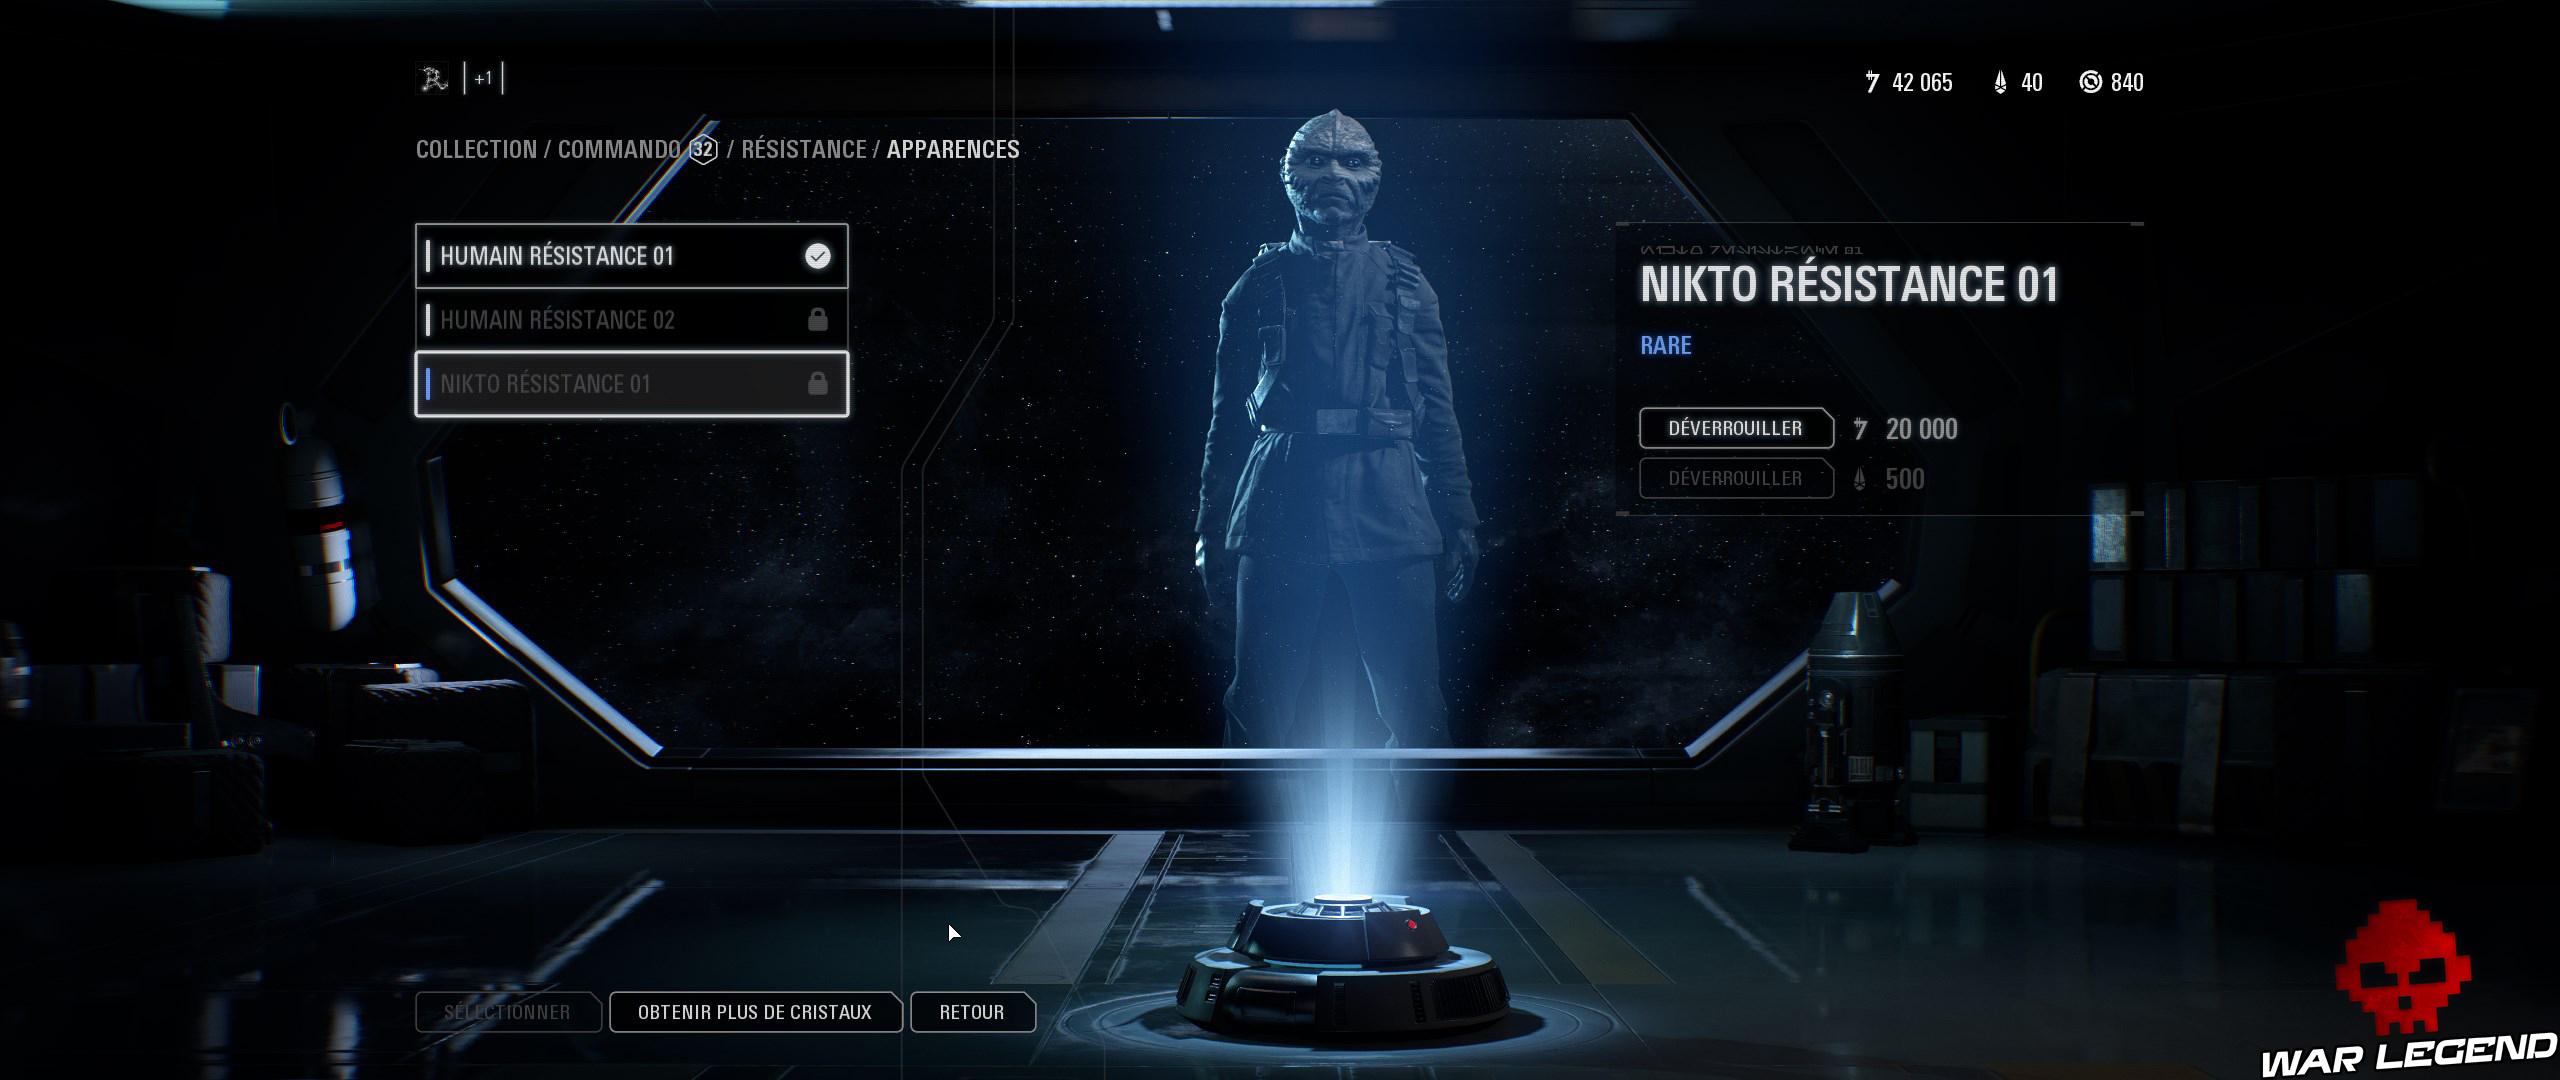 ReTest Star Wars Battlefront II skin rebelle